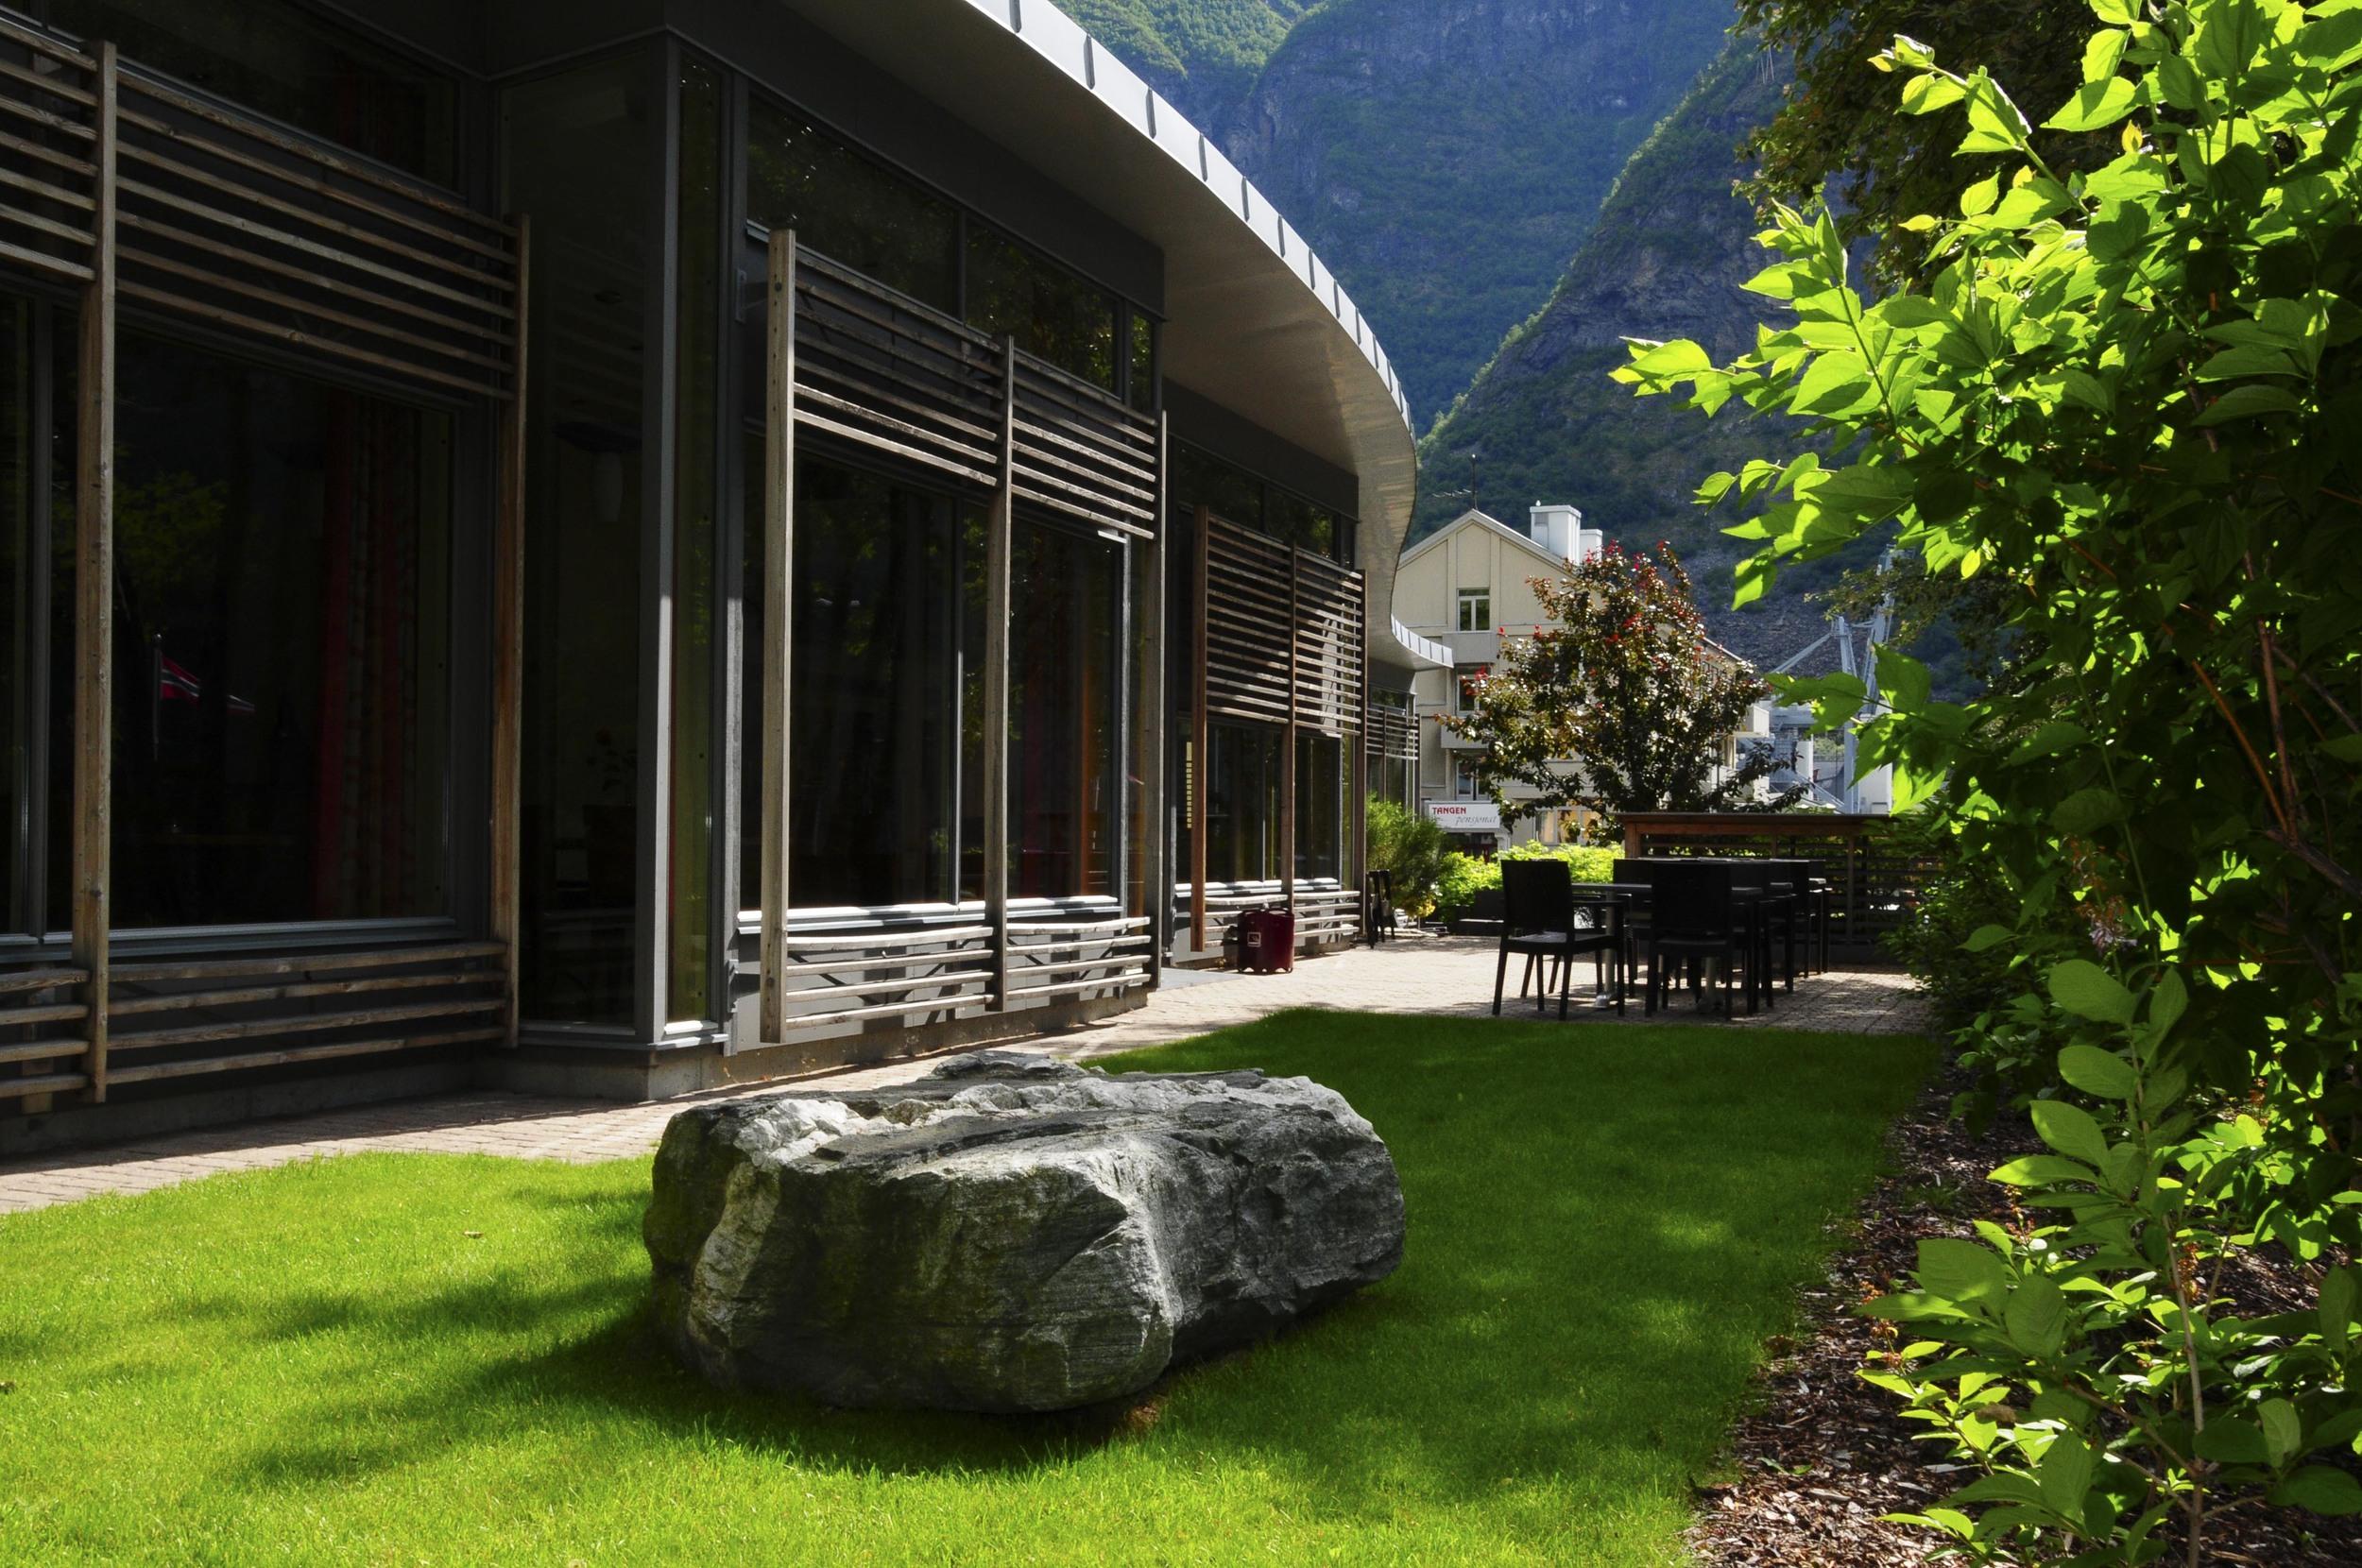 Klingenberg Hotel-hagen- DCIM_101ND300_7RM_6965.jpg